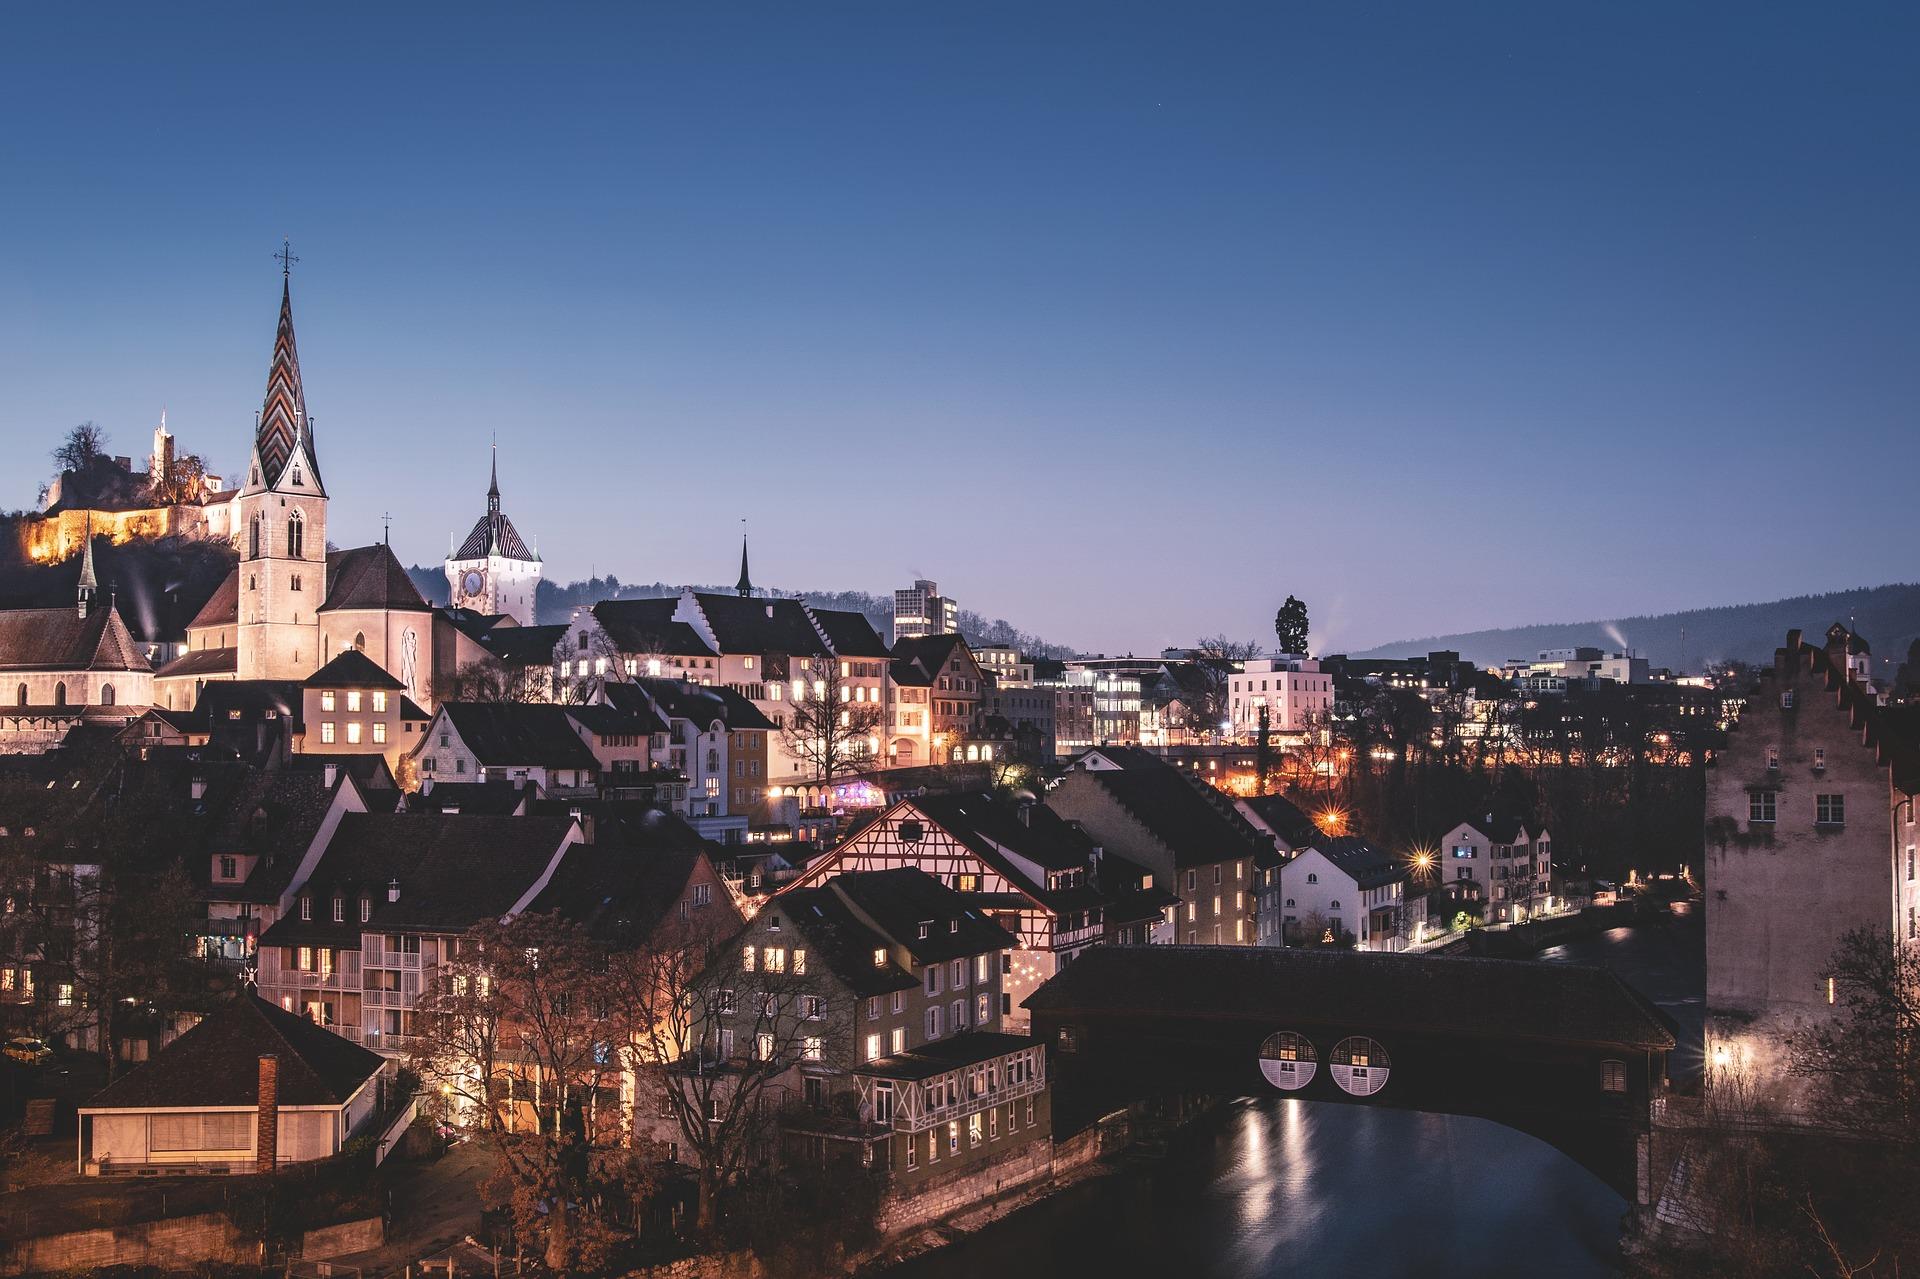 Top Things To Do in Baden, Switzerland